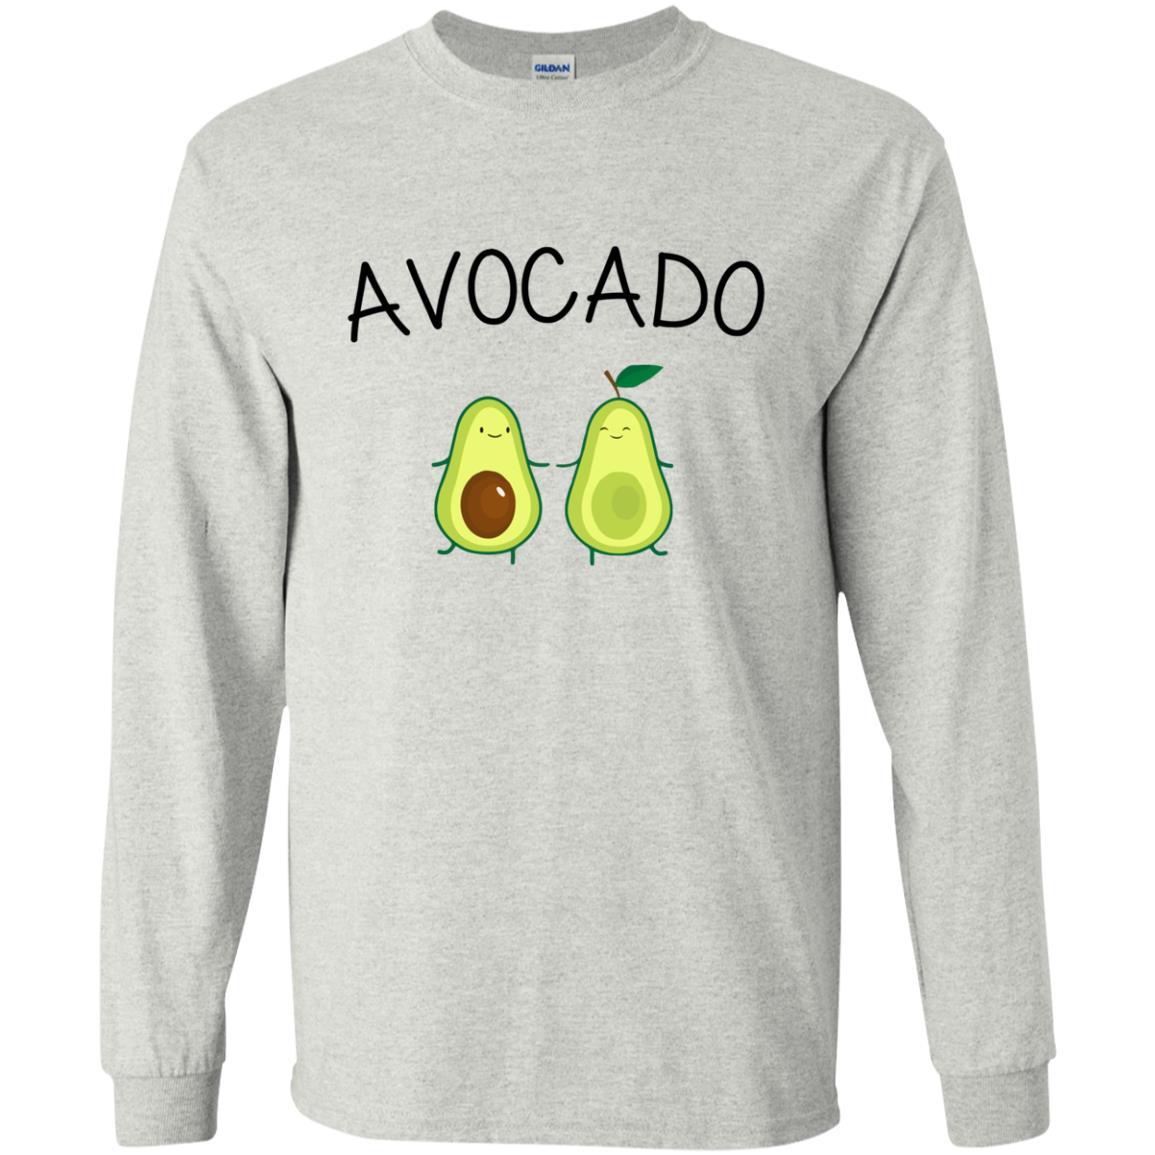 image 15 - Vegan Avocado Shirt, Sweater, Hoodie